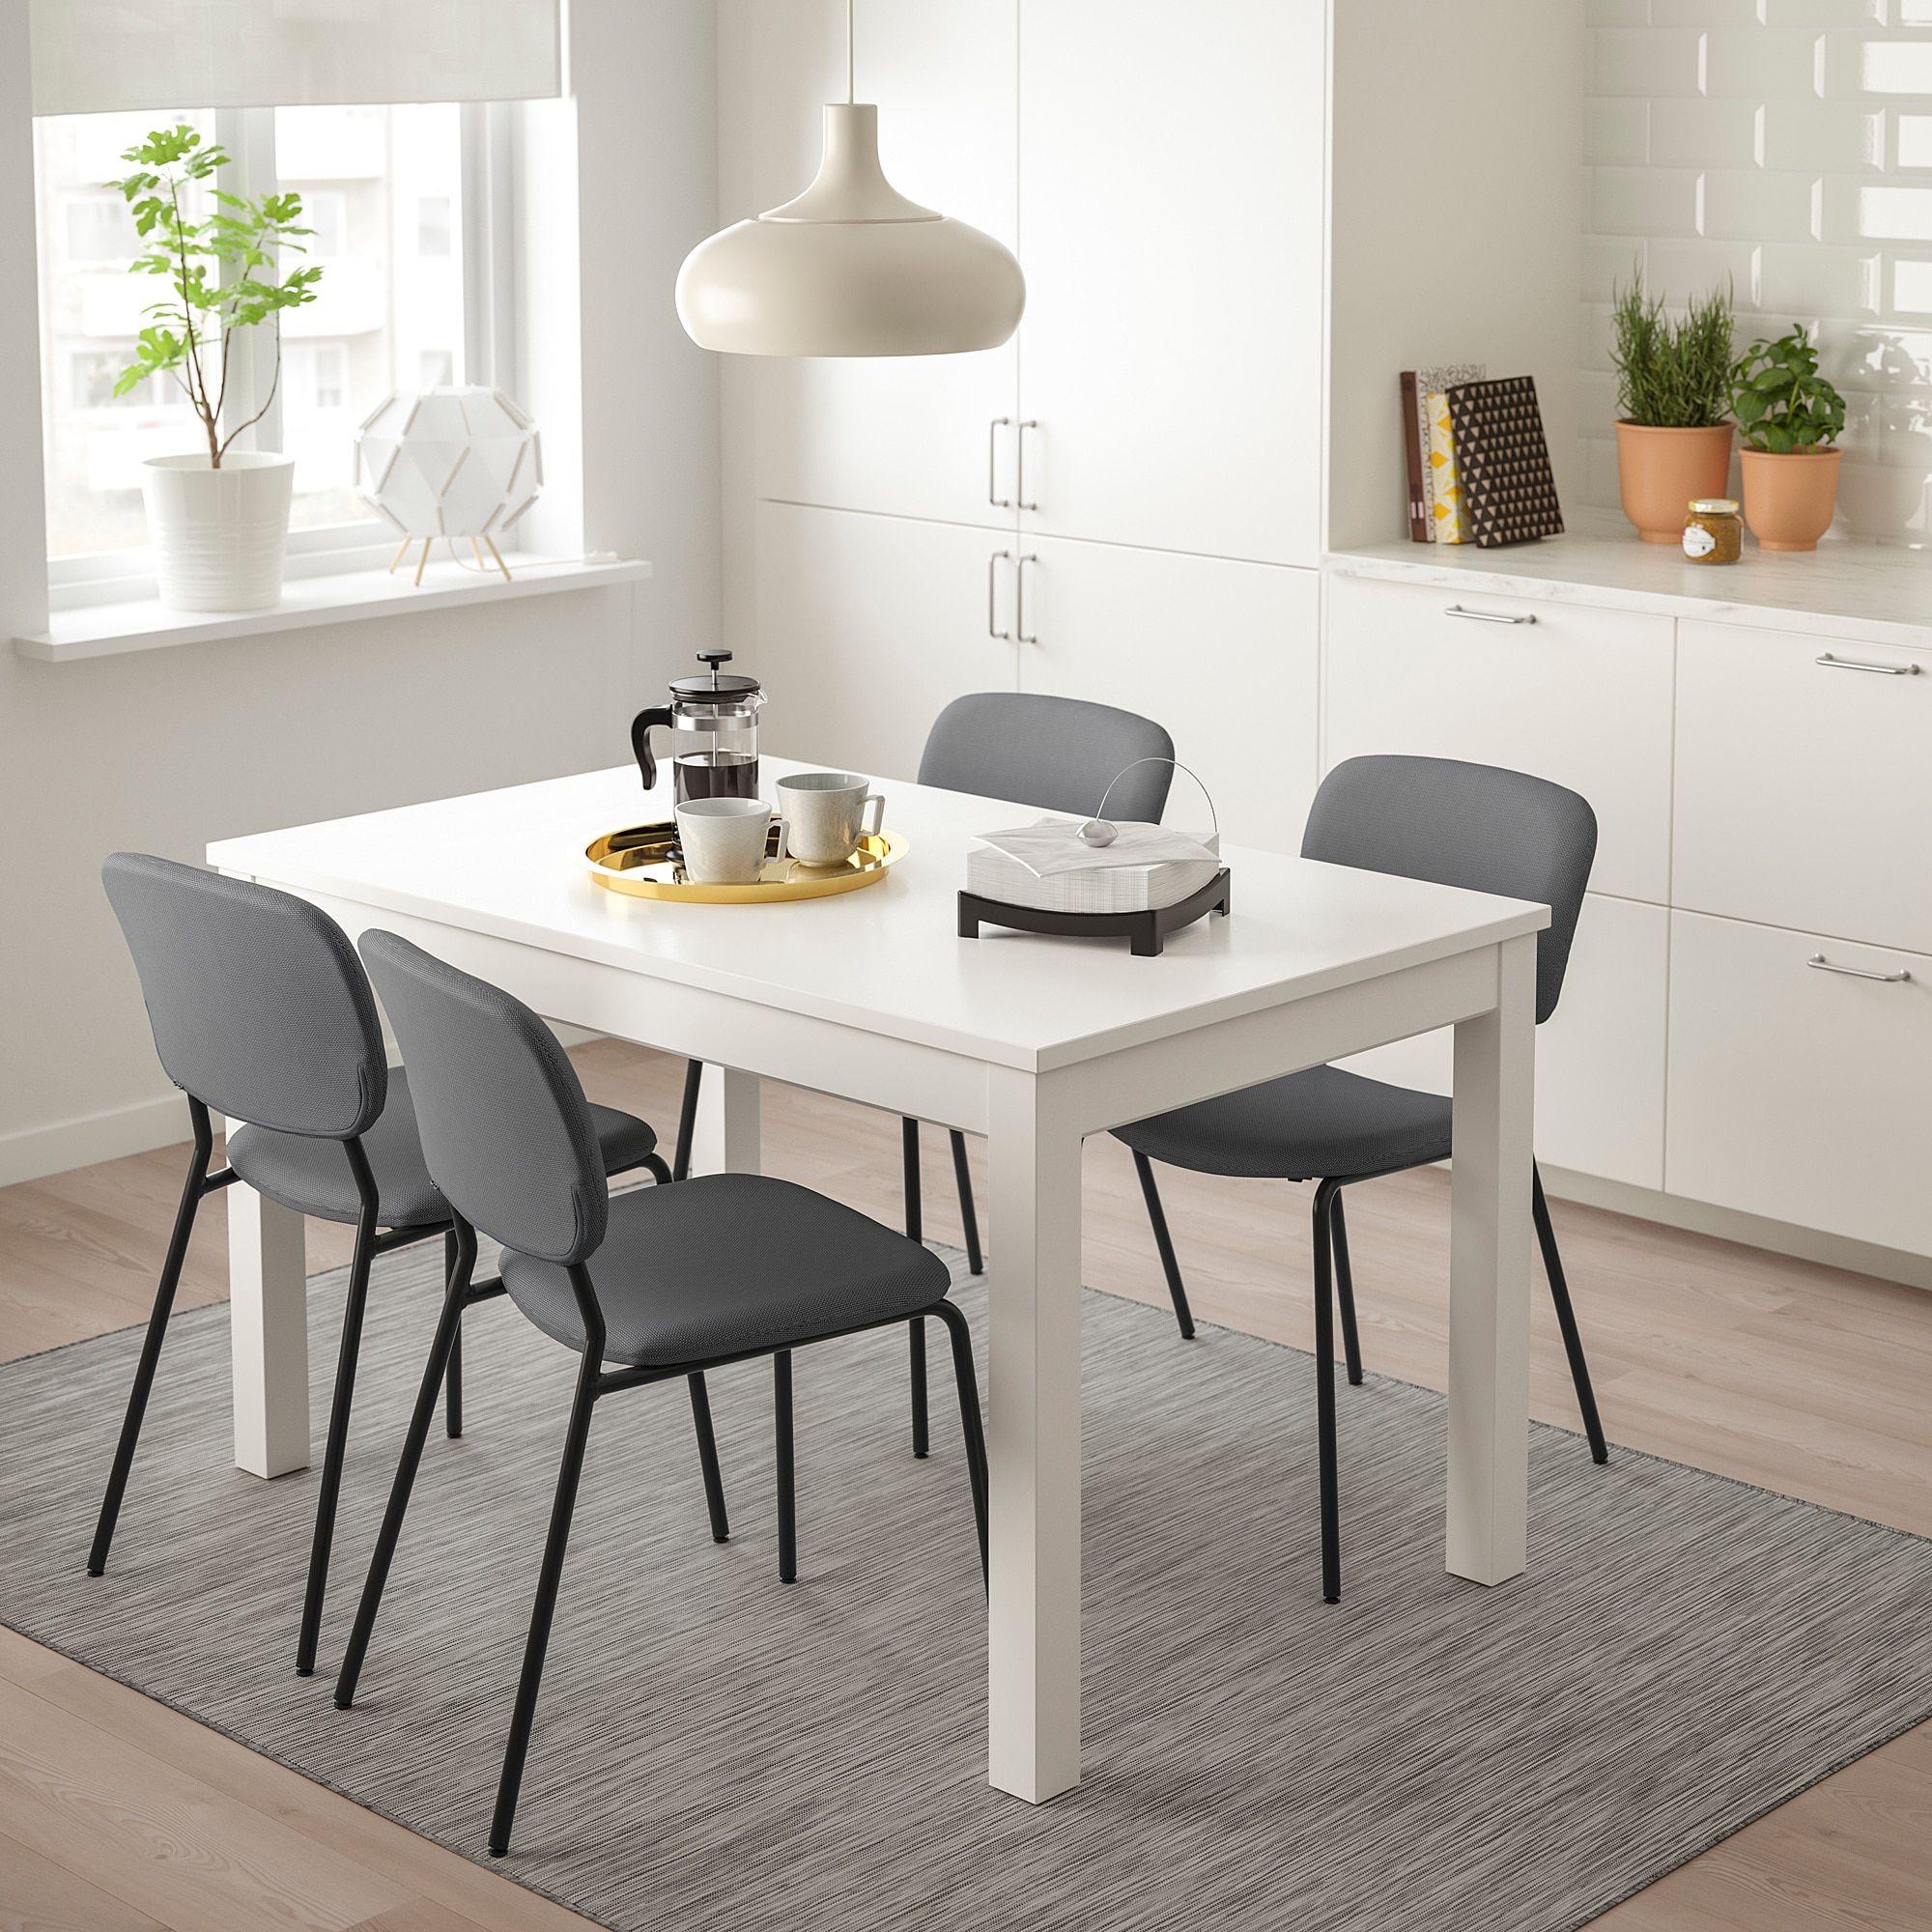 Dark Gray Table